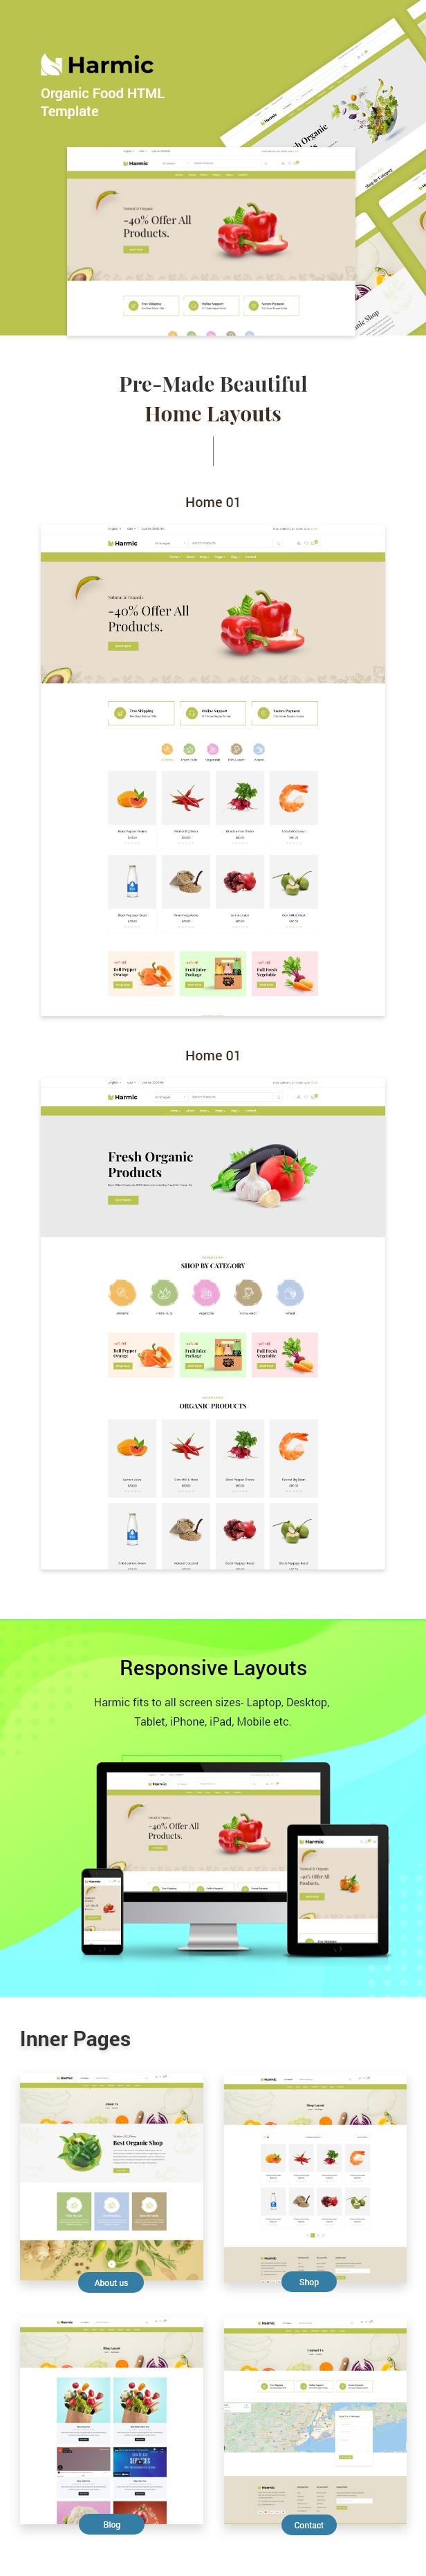 Harmic - Organic Food HTML Template - 1